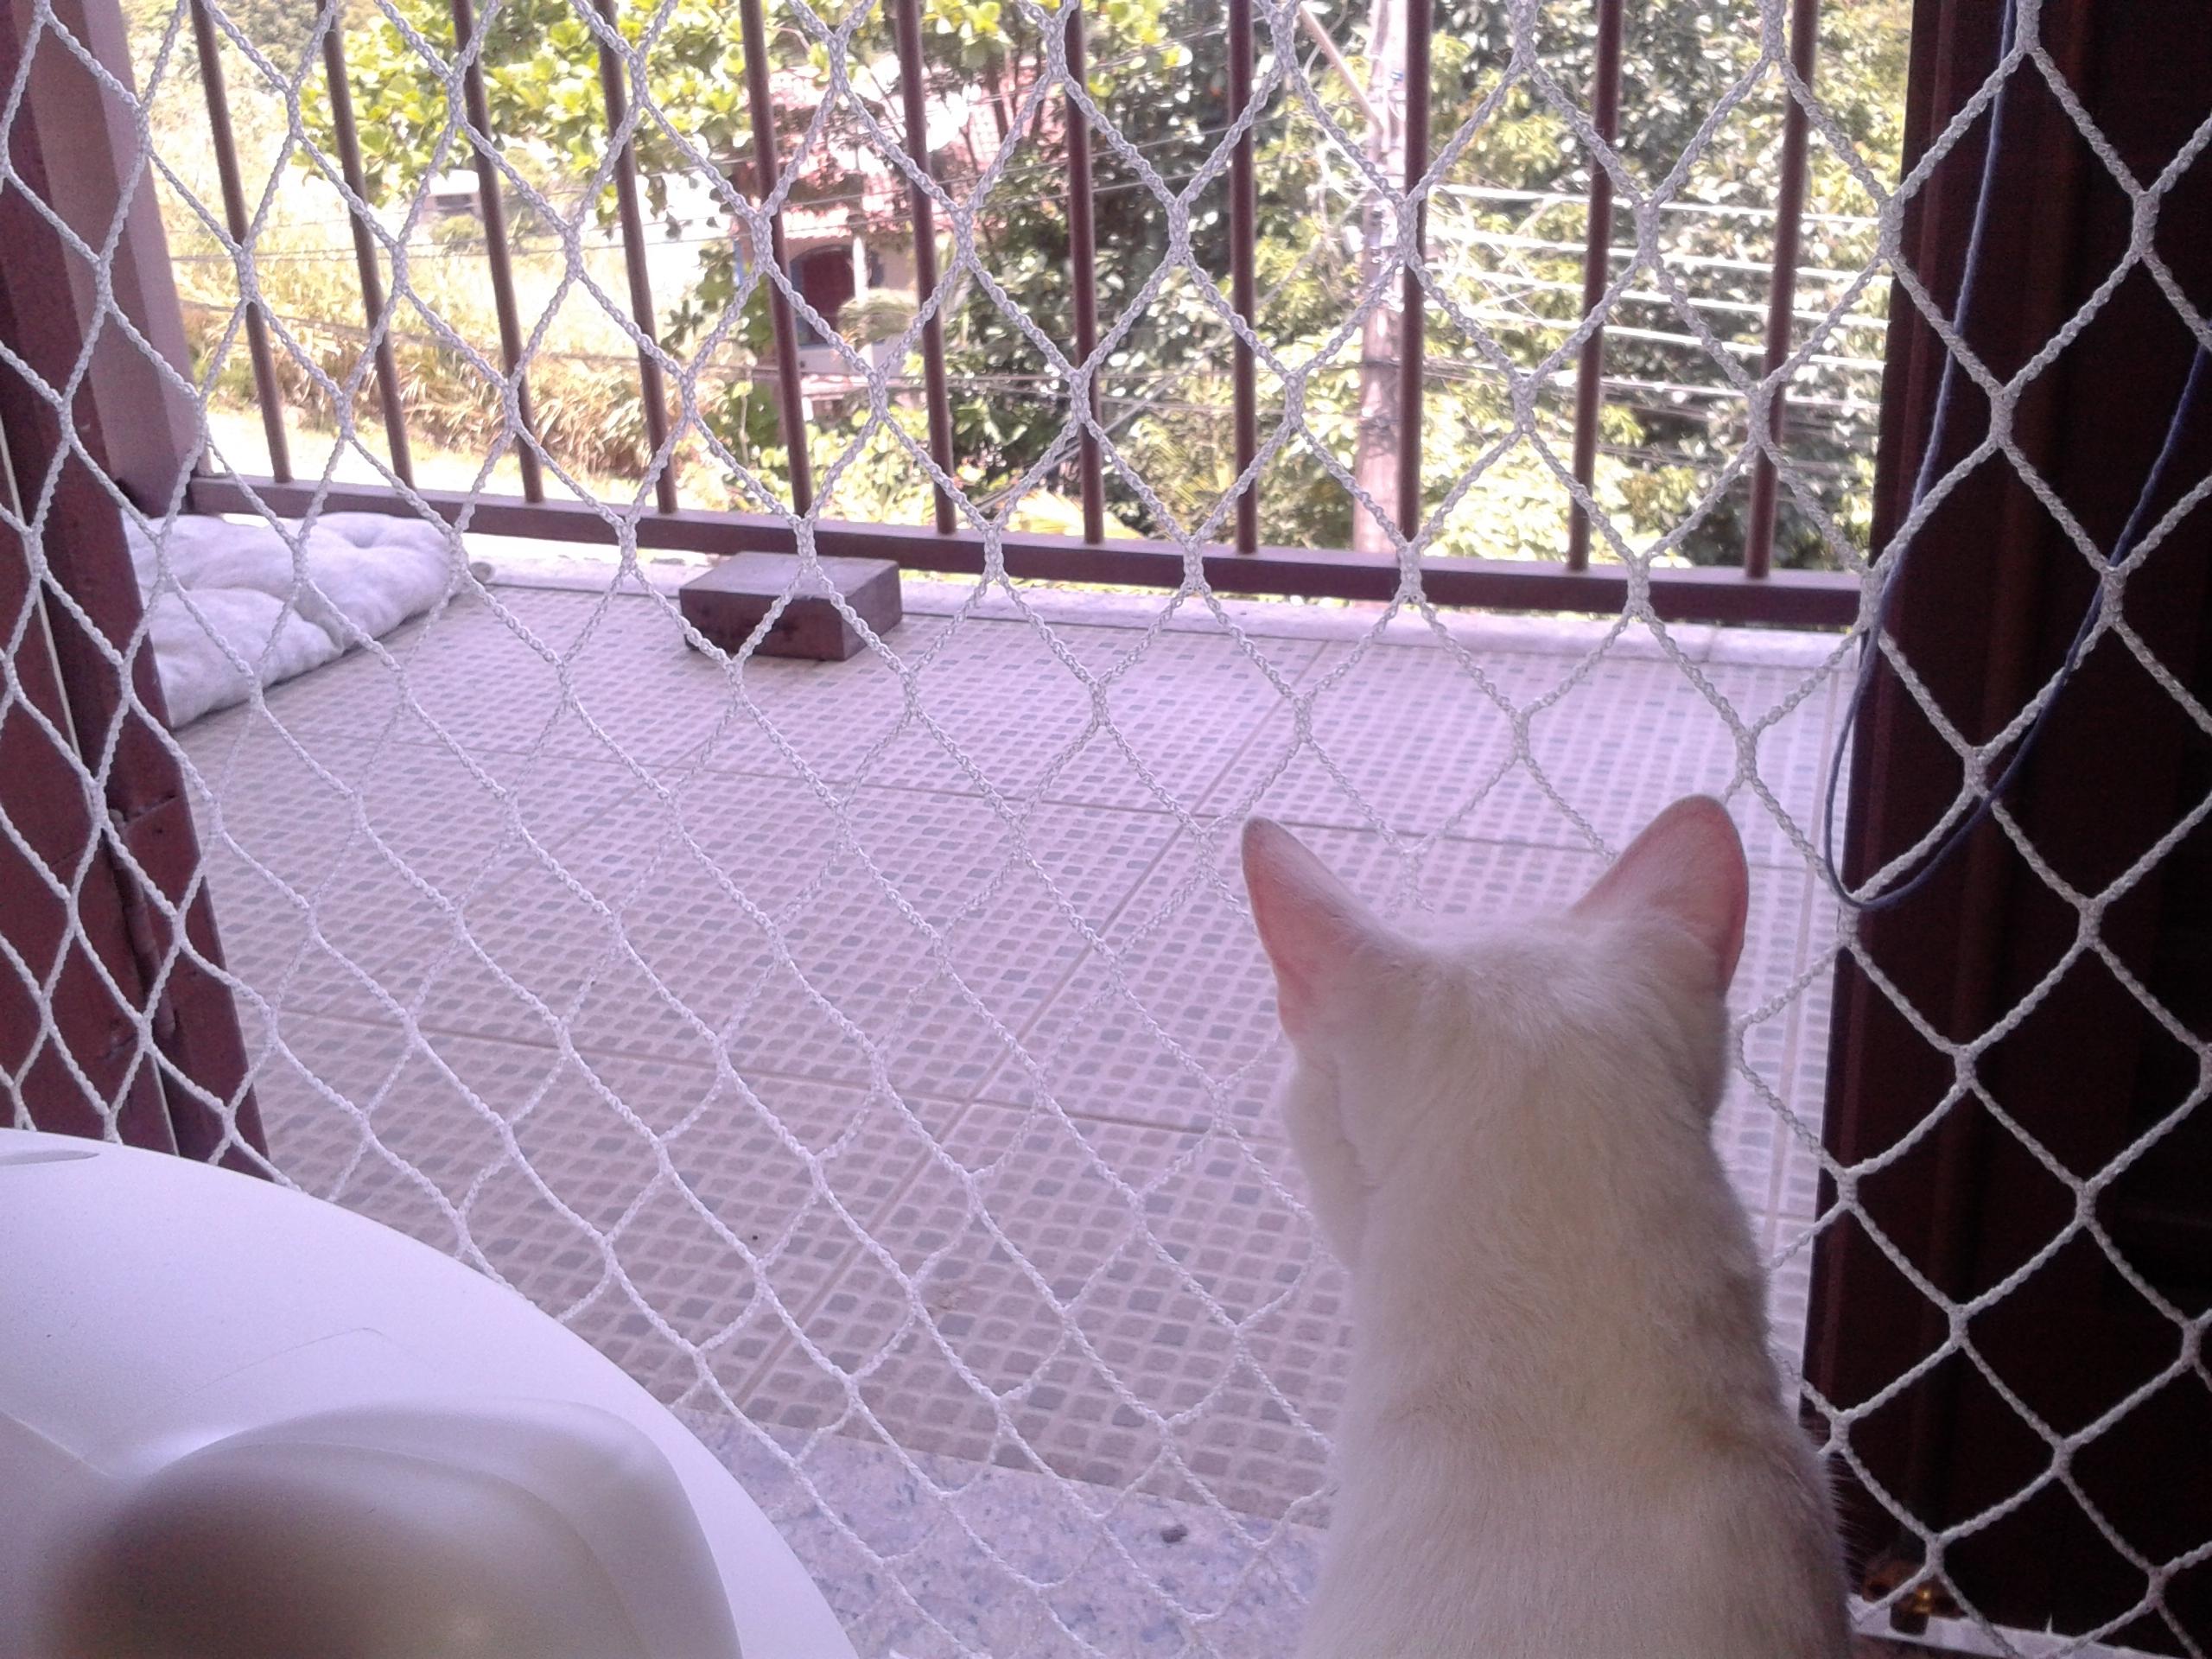 gato olhando